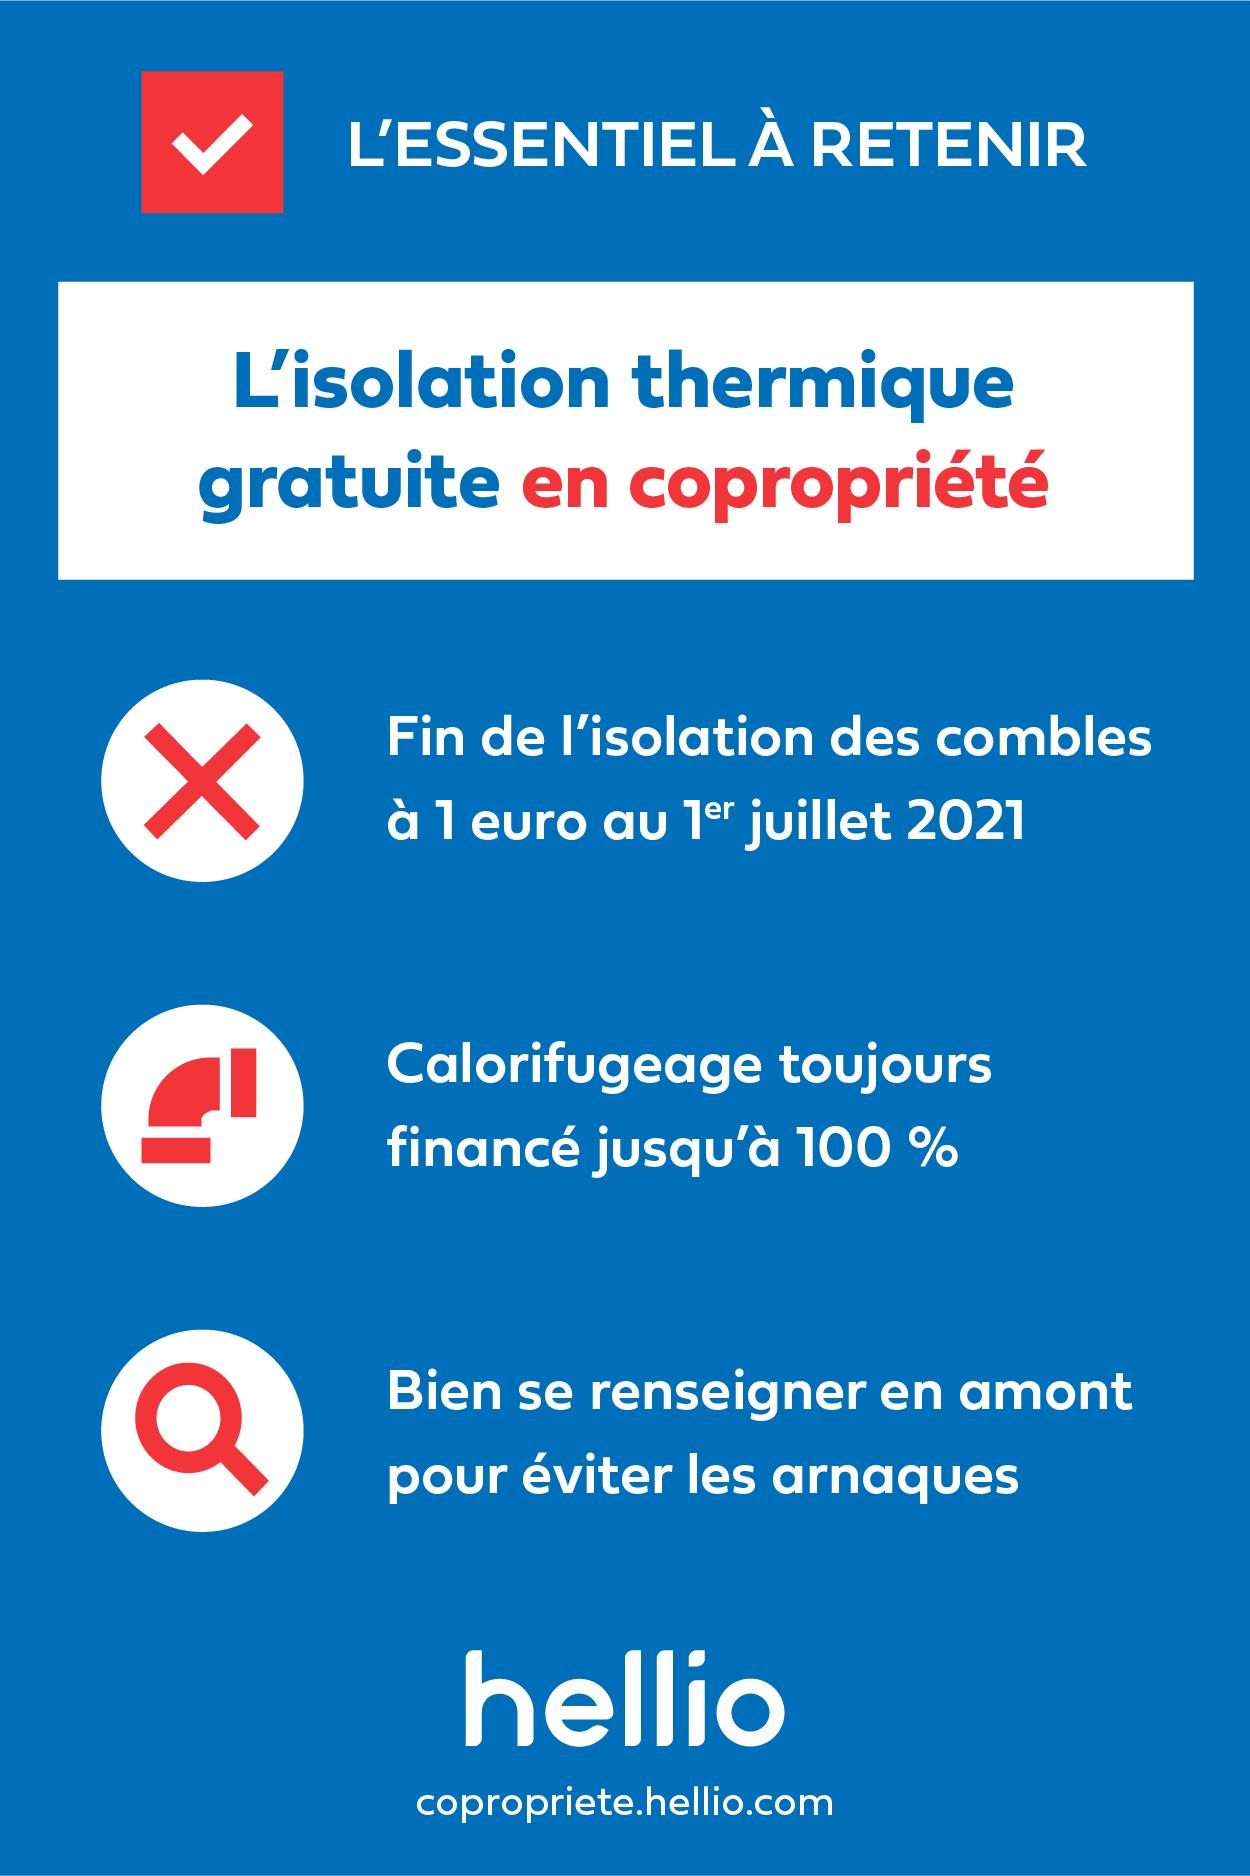 infographie-essentiel-retenir-hellio-copropriete-isolation-gratuite